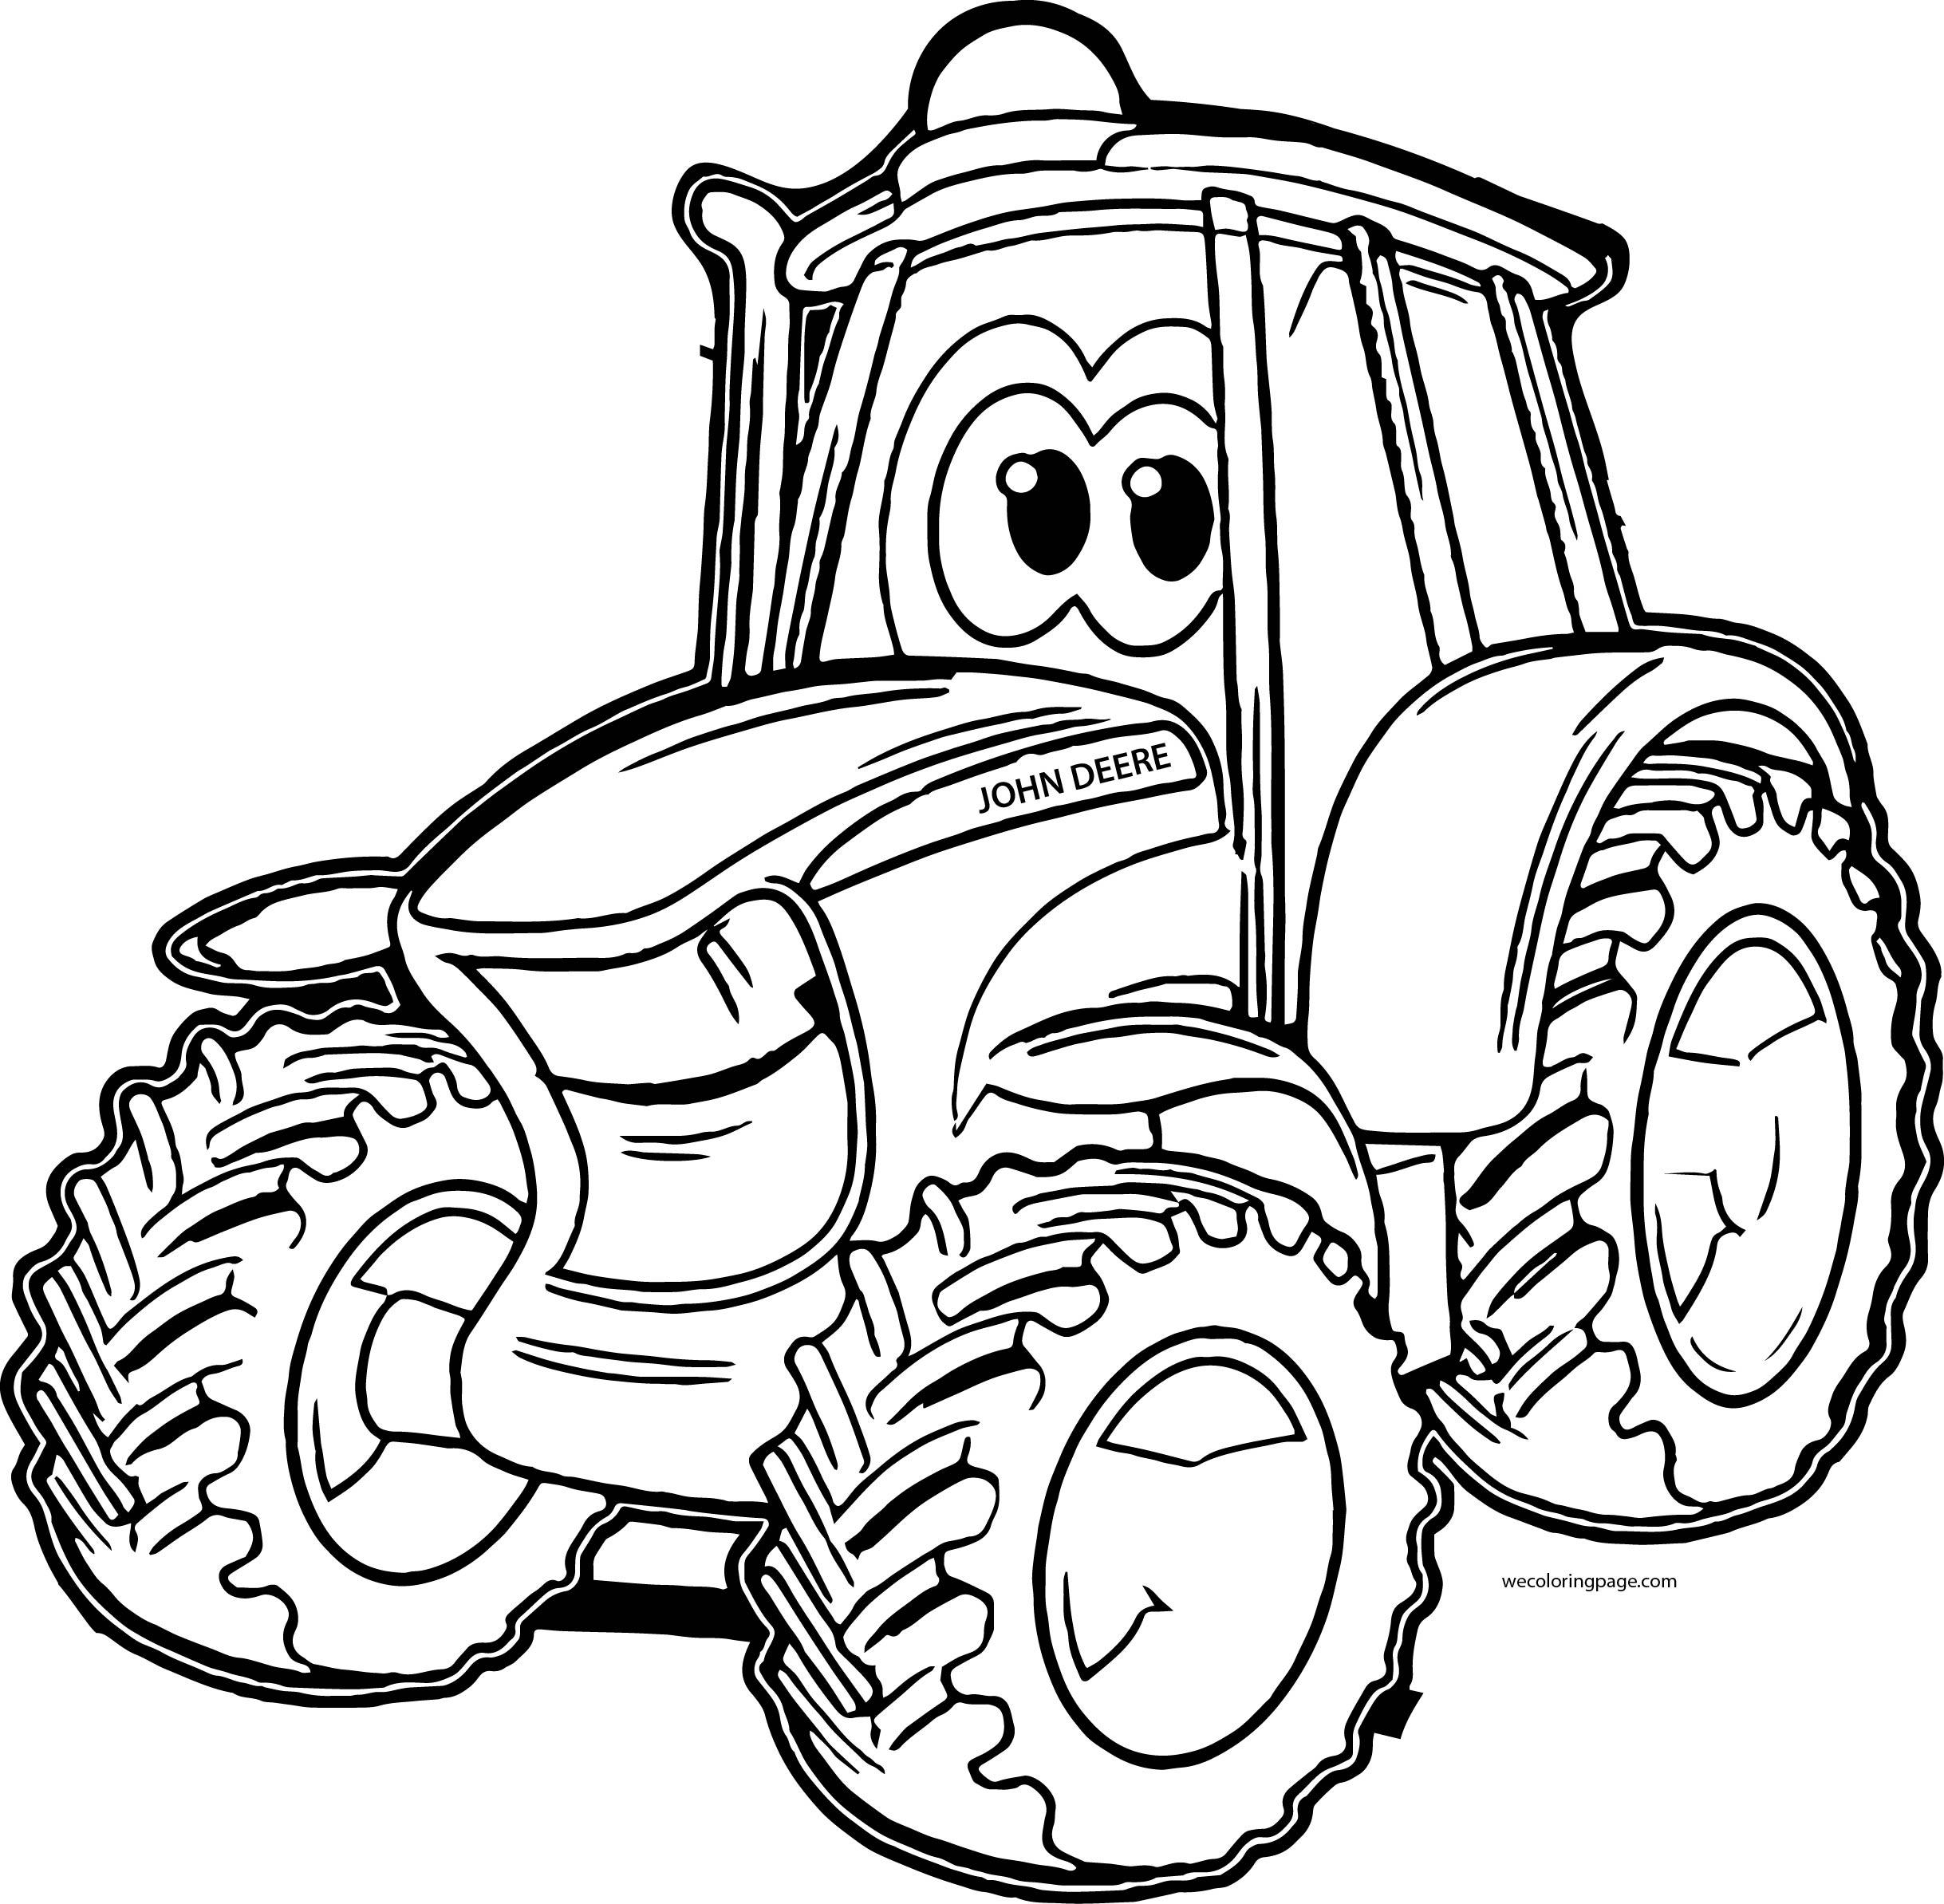 komputer ando ausmalbilder traktor john deere kostenlos